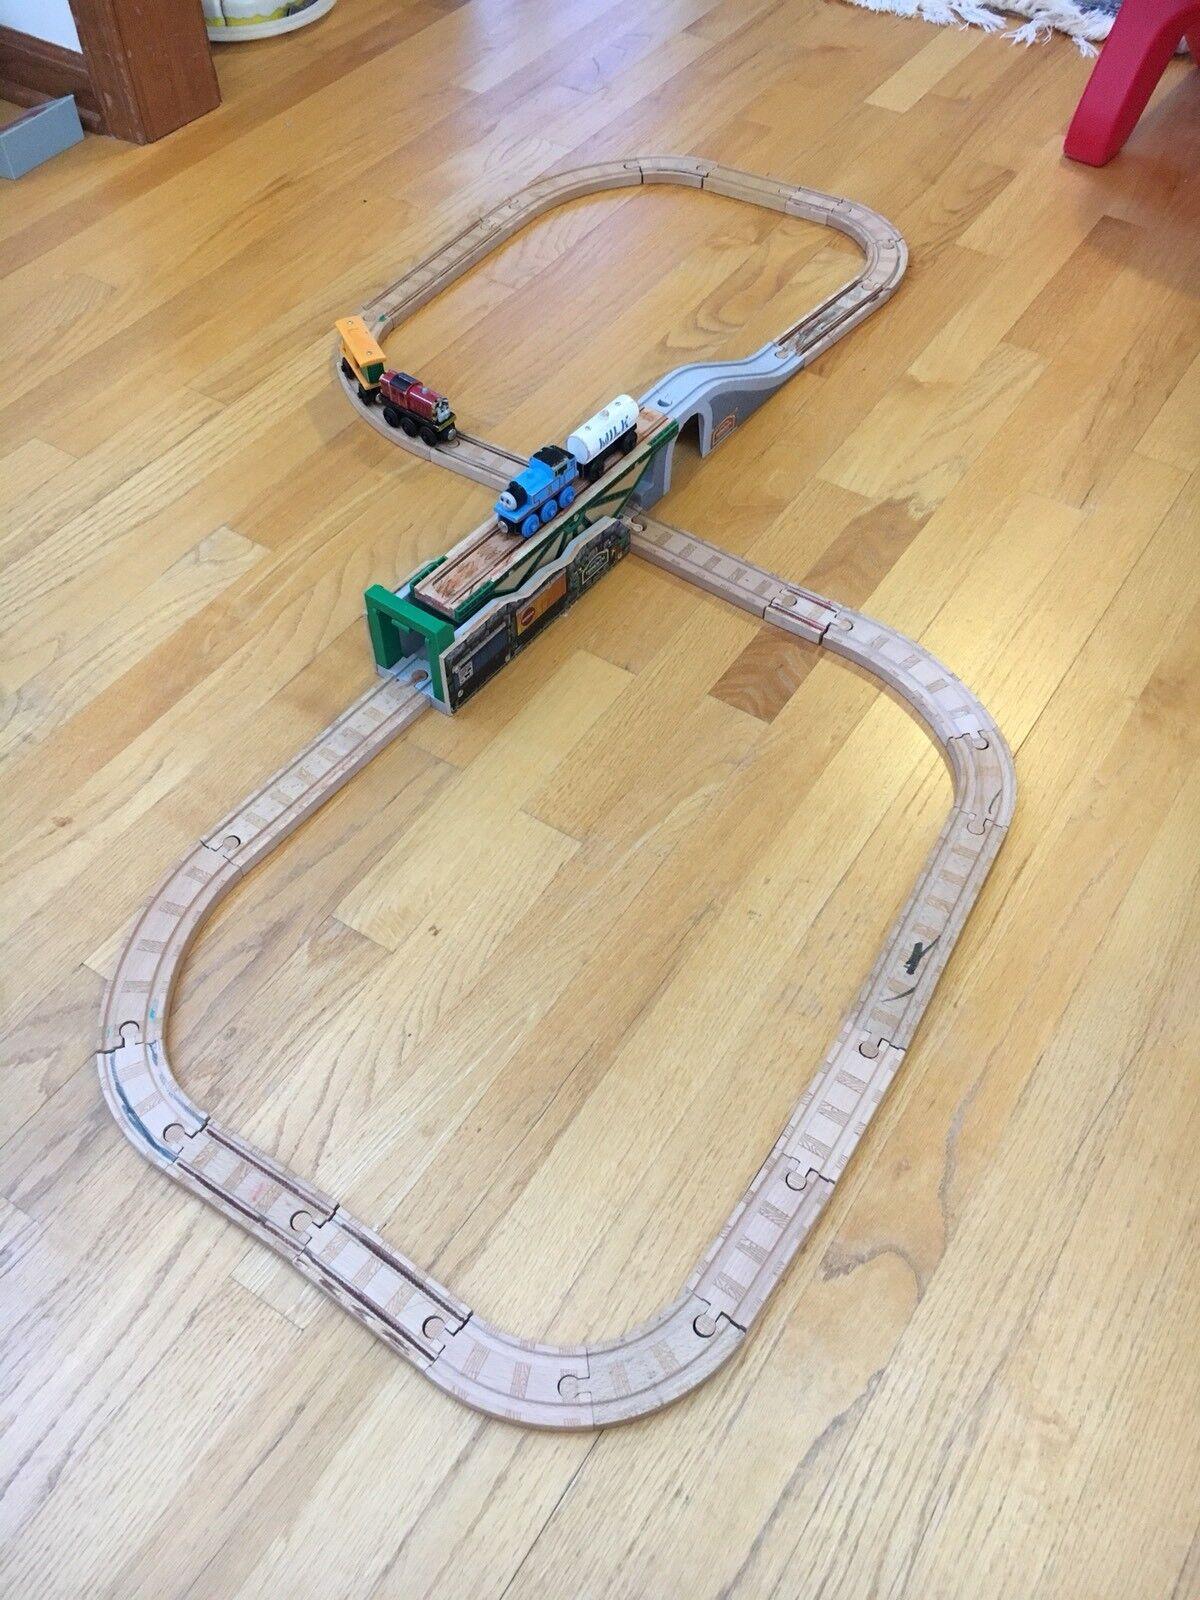 Thomas & Friends Wooden Railway, Tipping Tidmouth Bridge